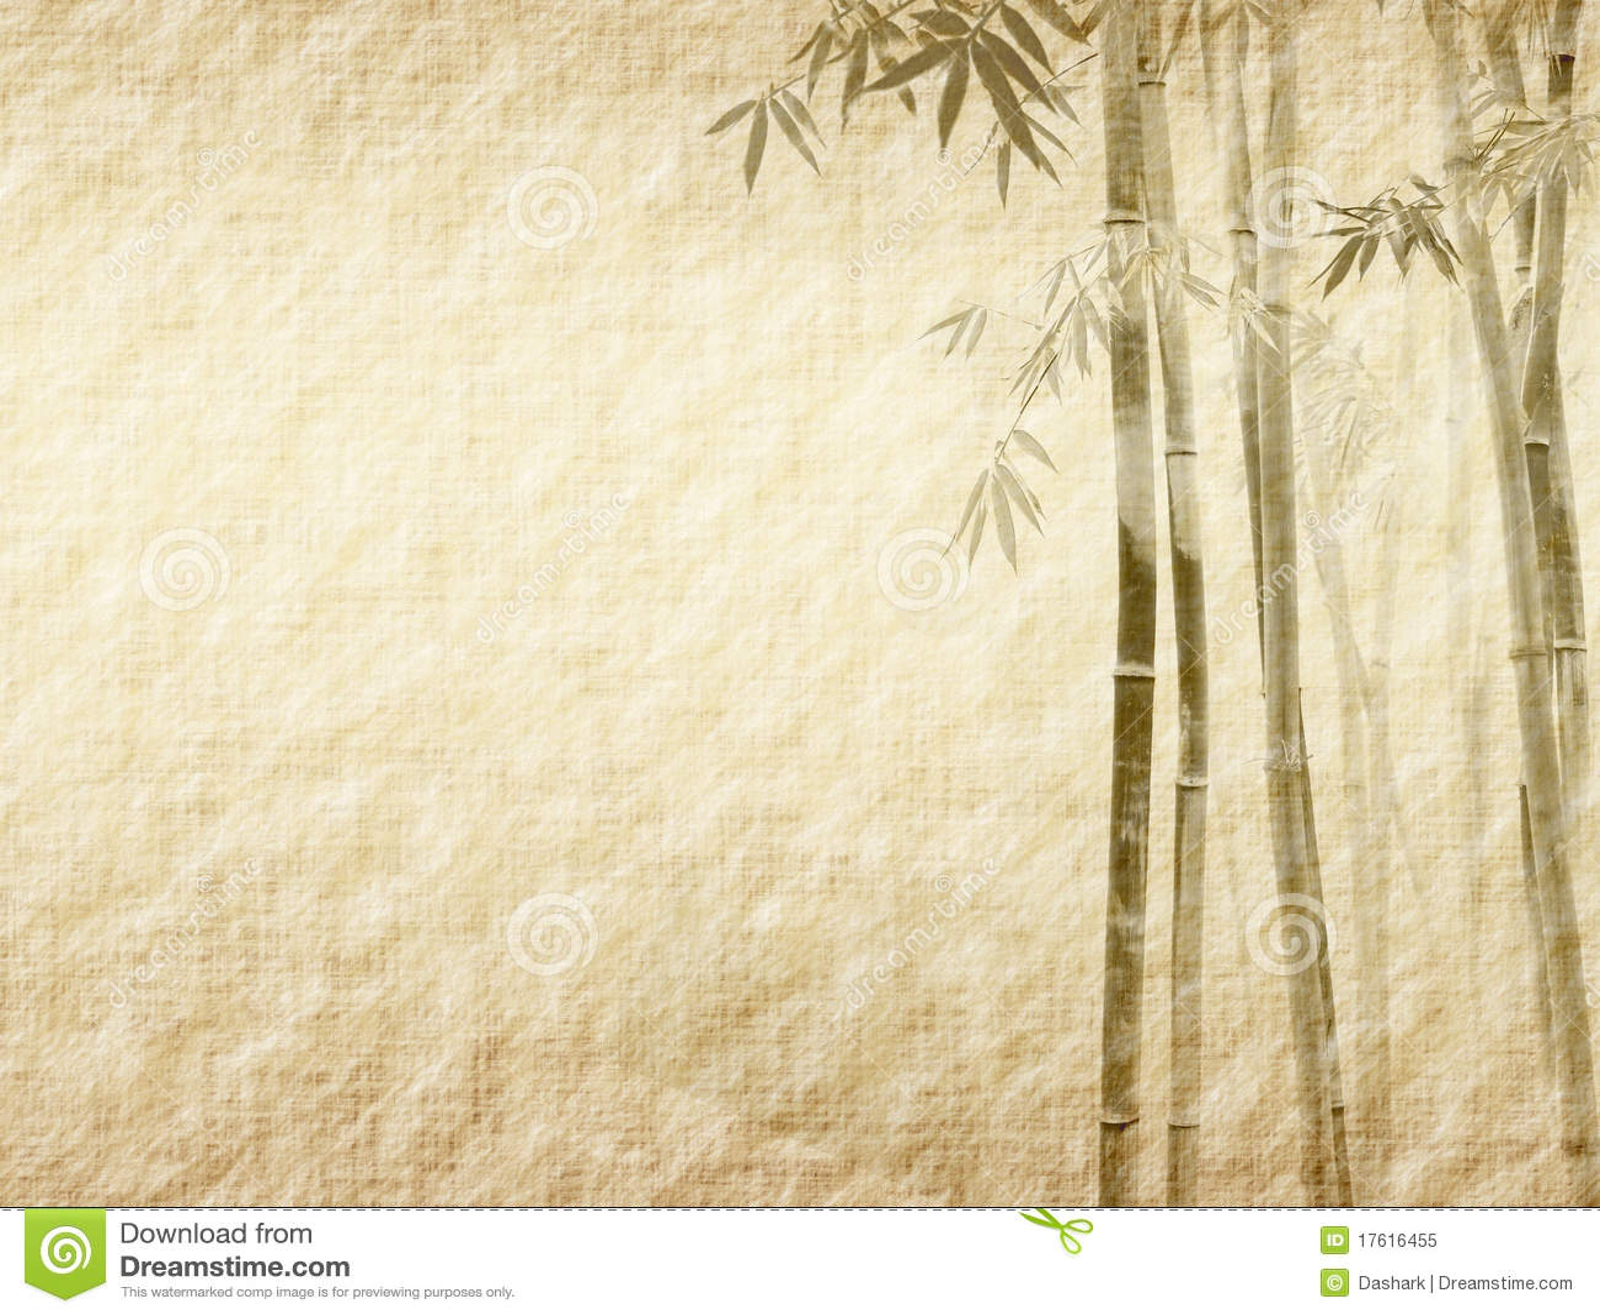 Grunge antique bamboo выходит старая бумага